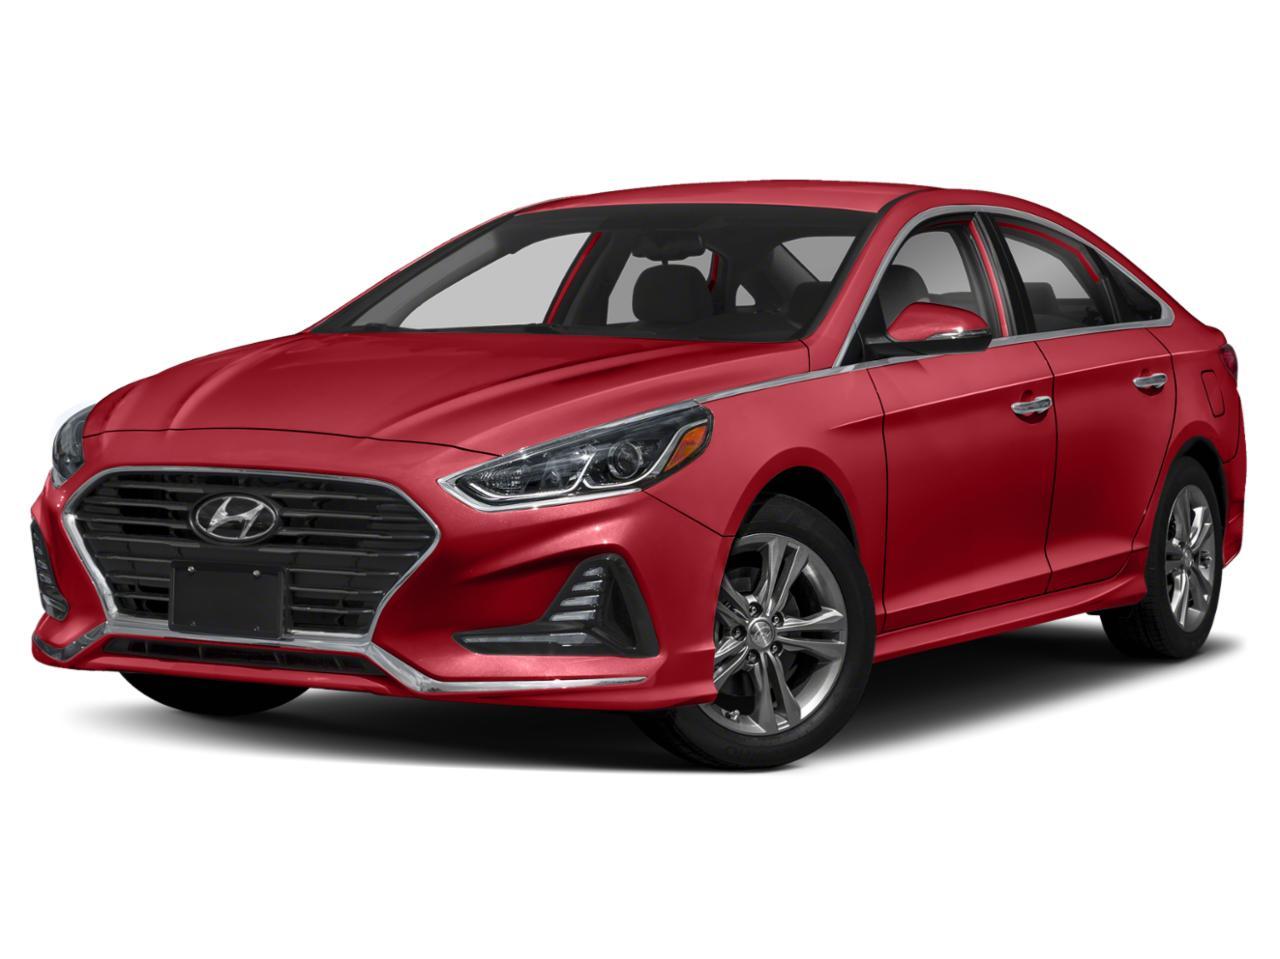 2019 Hyundai Sonata Vehicle Photo in Milton, FL 32570